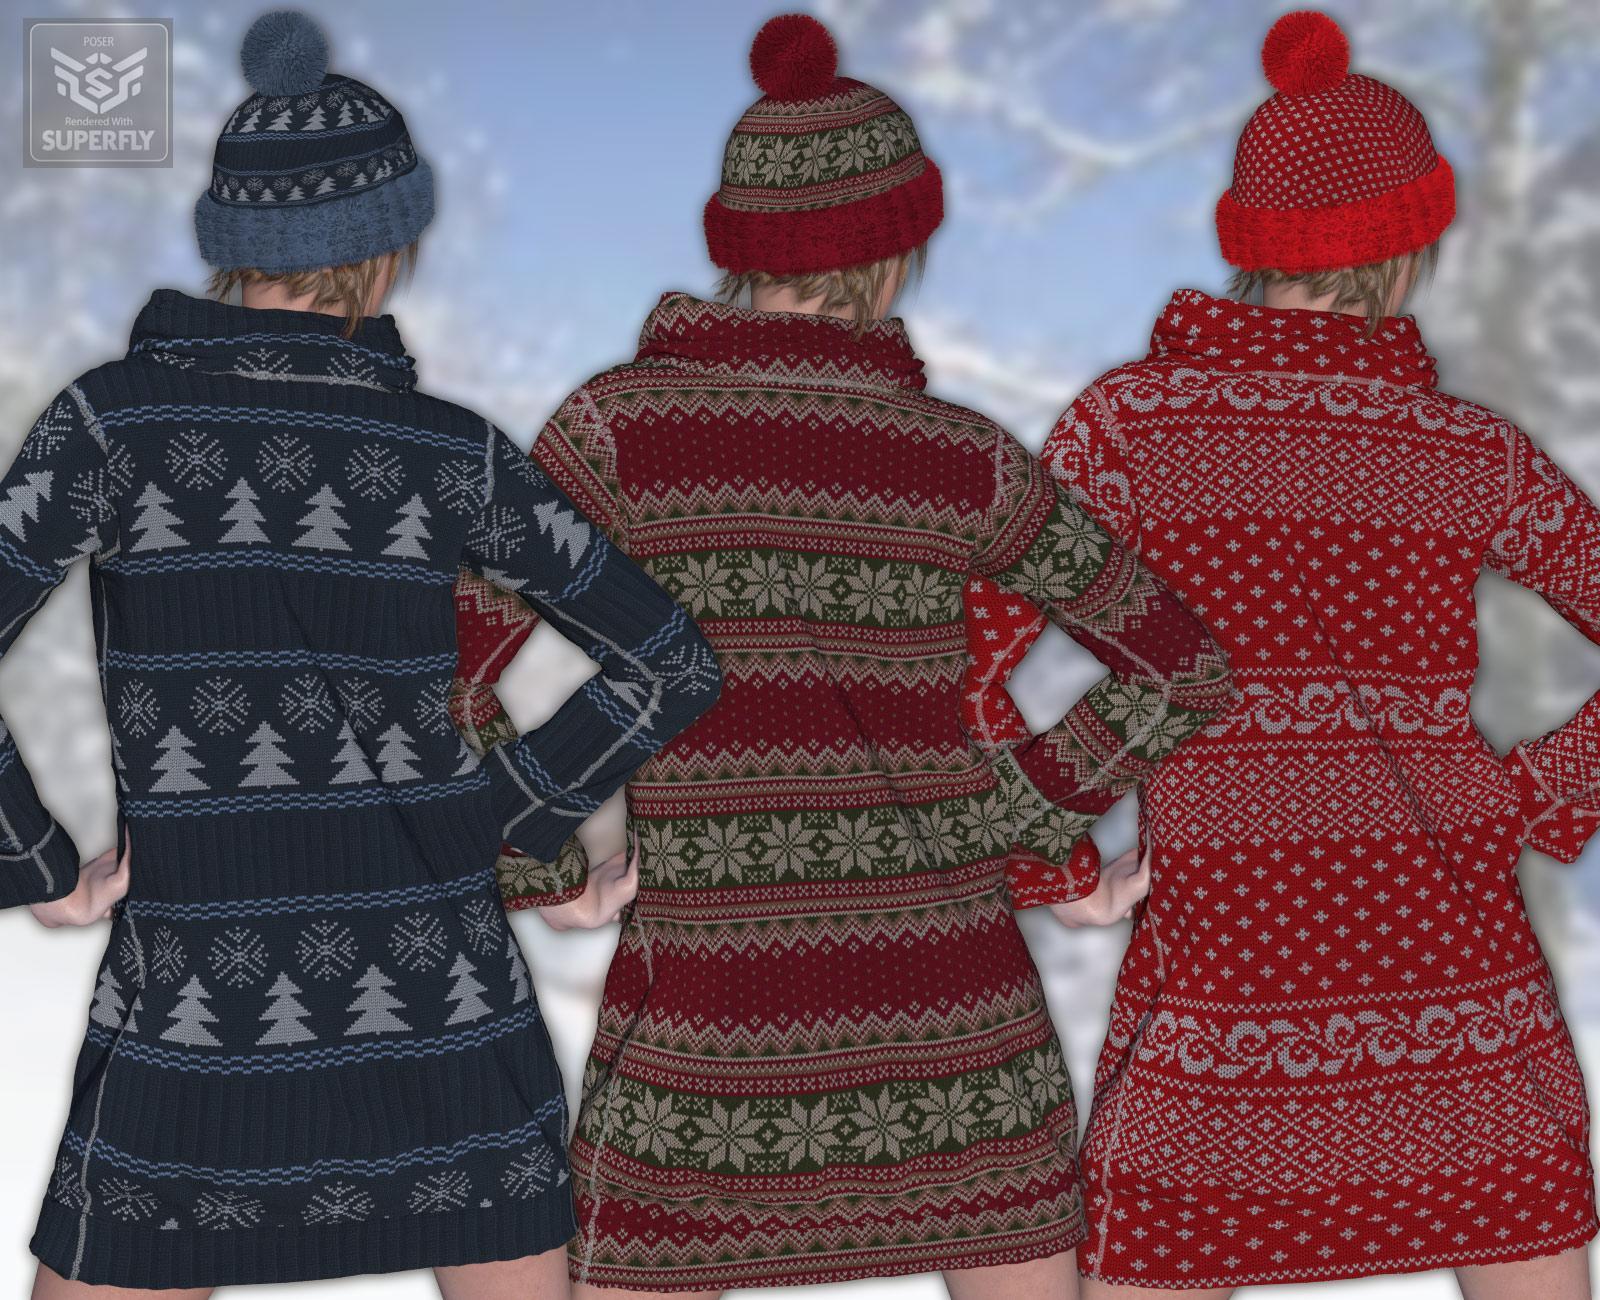 Wintercap promo 8